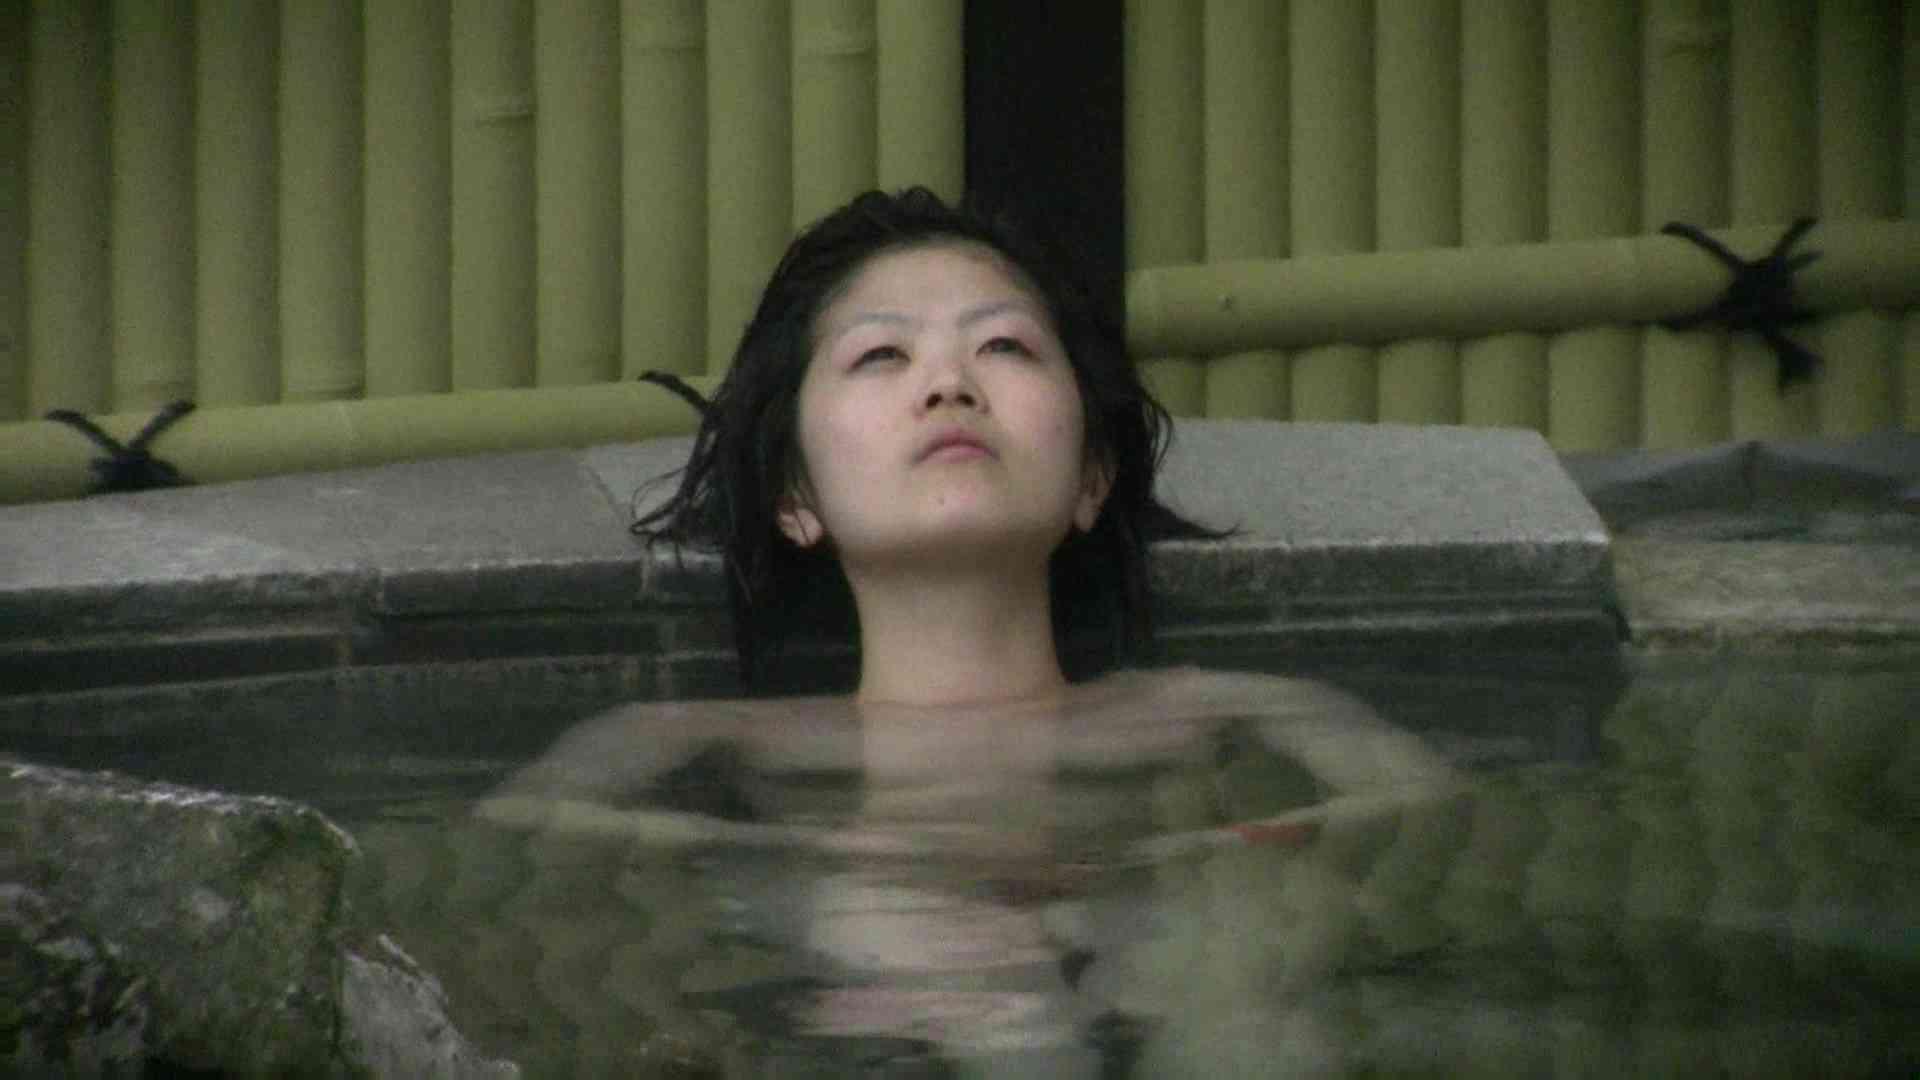 Aquaな露天風呂Vol.538 盗撮師作品 おめこ無修正動画無料 82pic 17